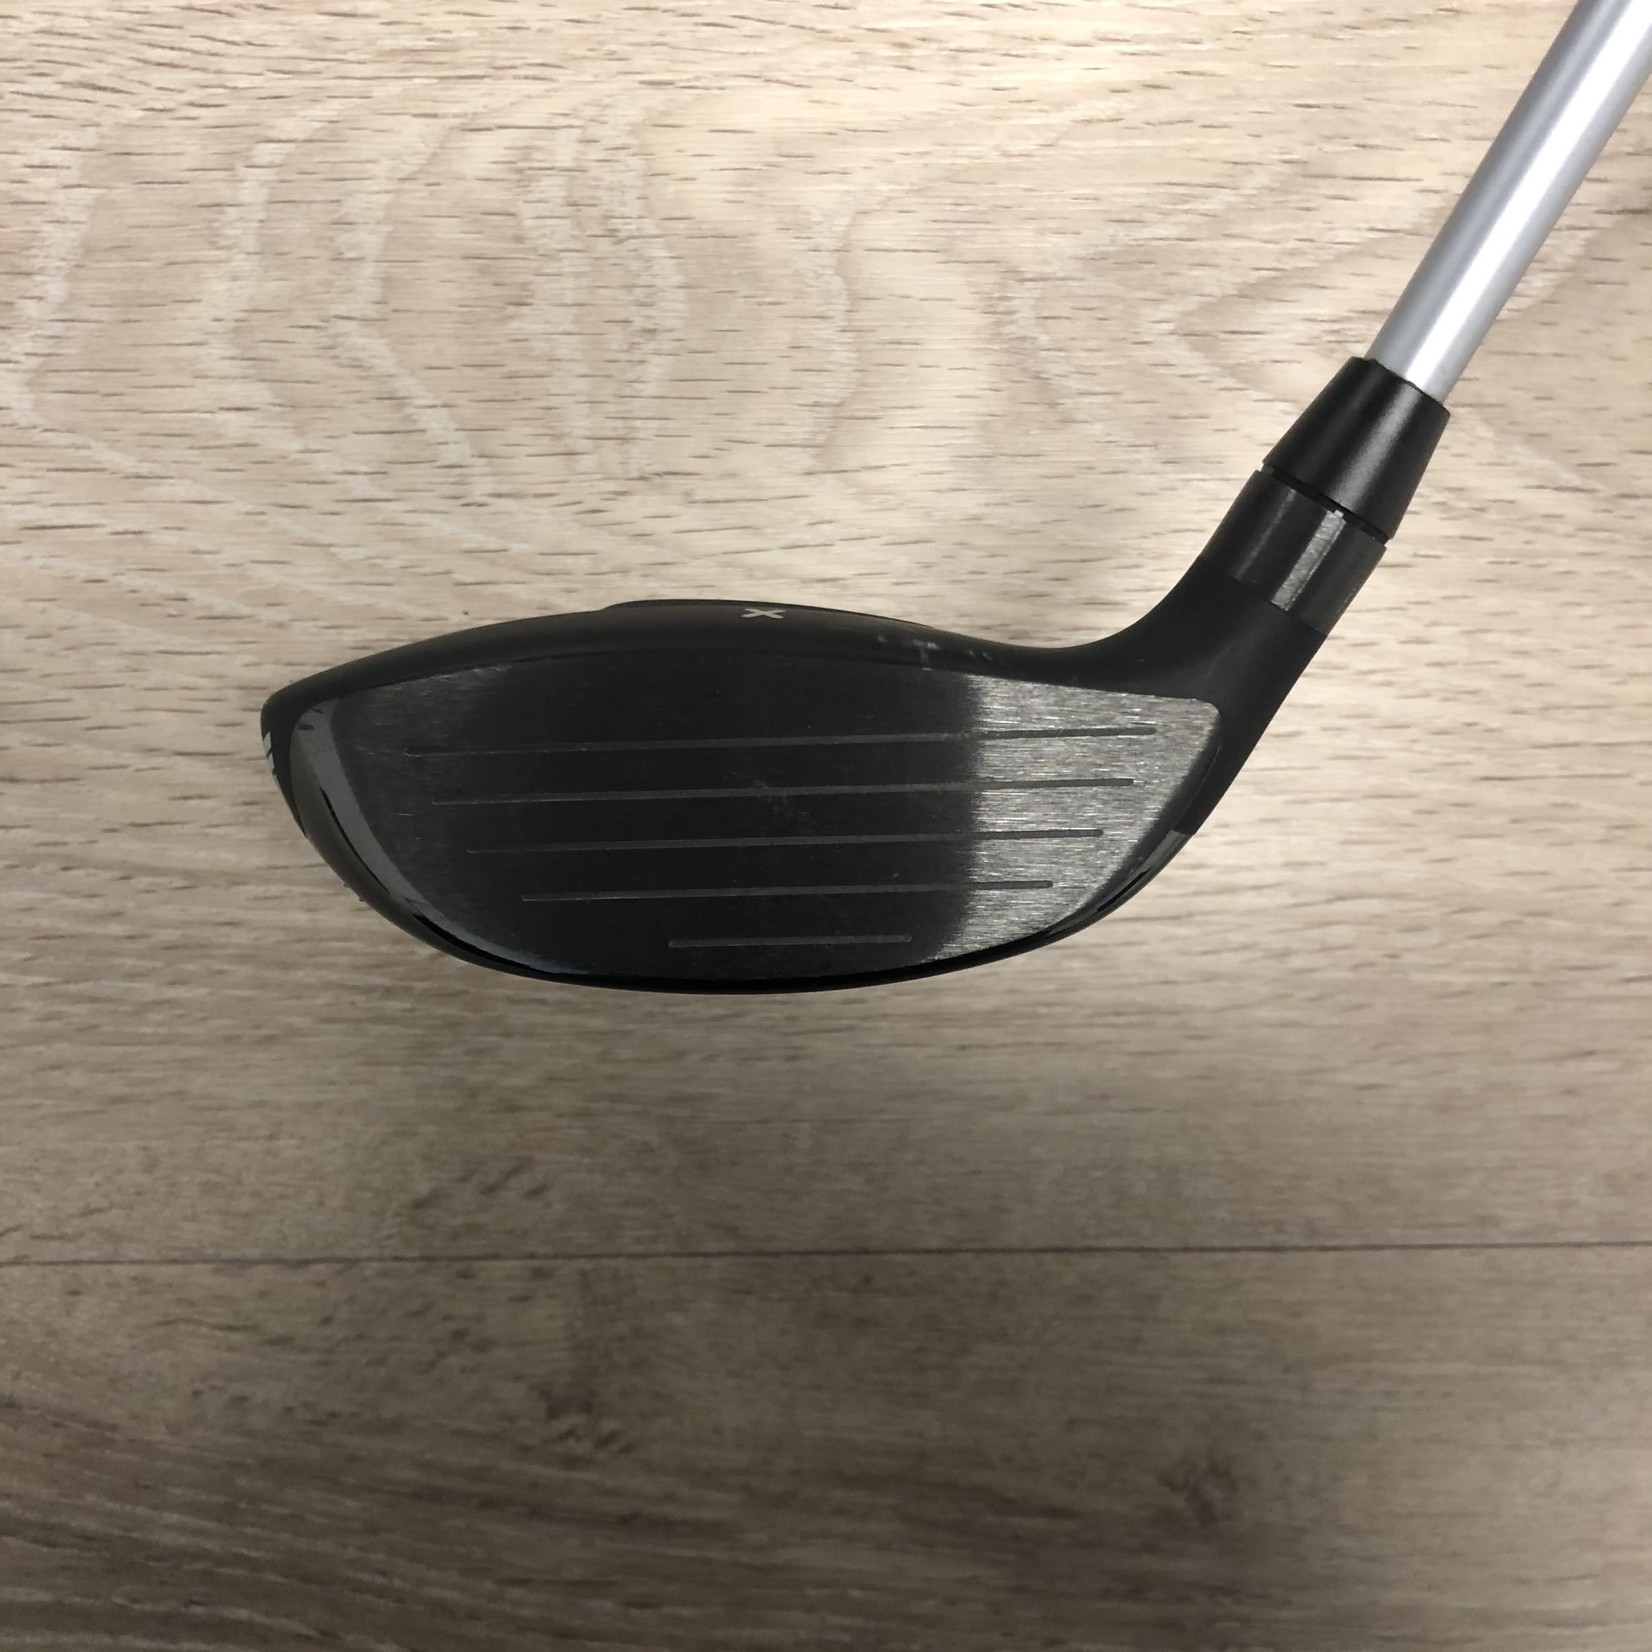 PXG PXG 0341 X 15* Fairway Wood Stiff Flex (RH)